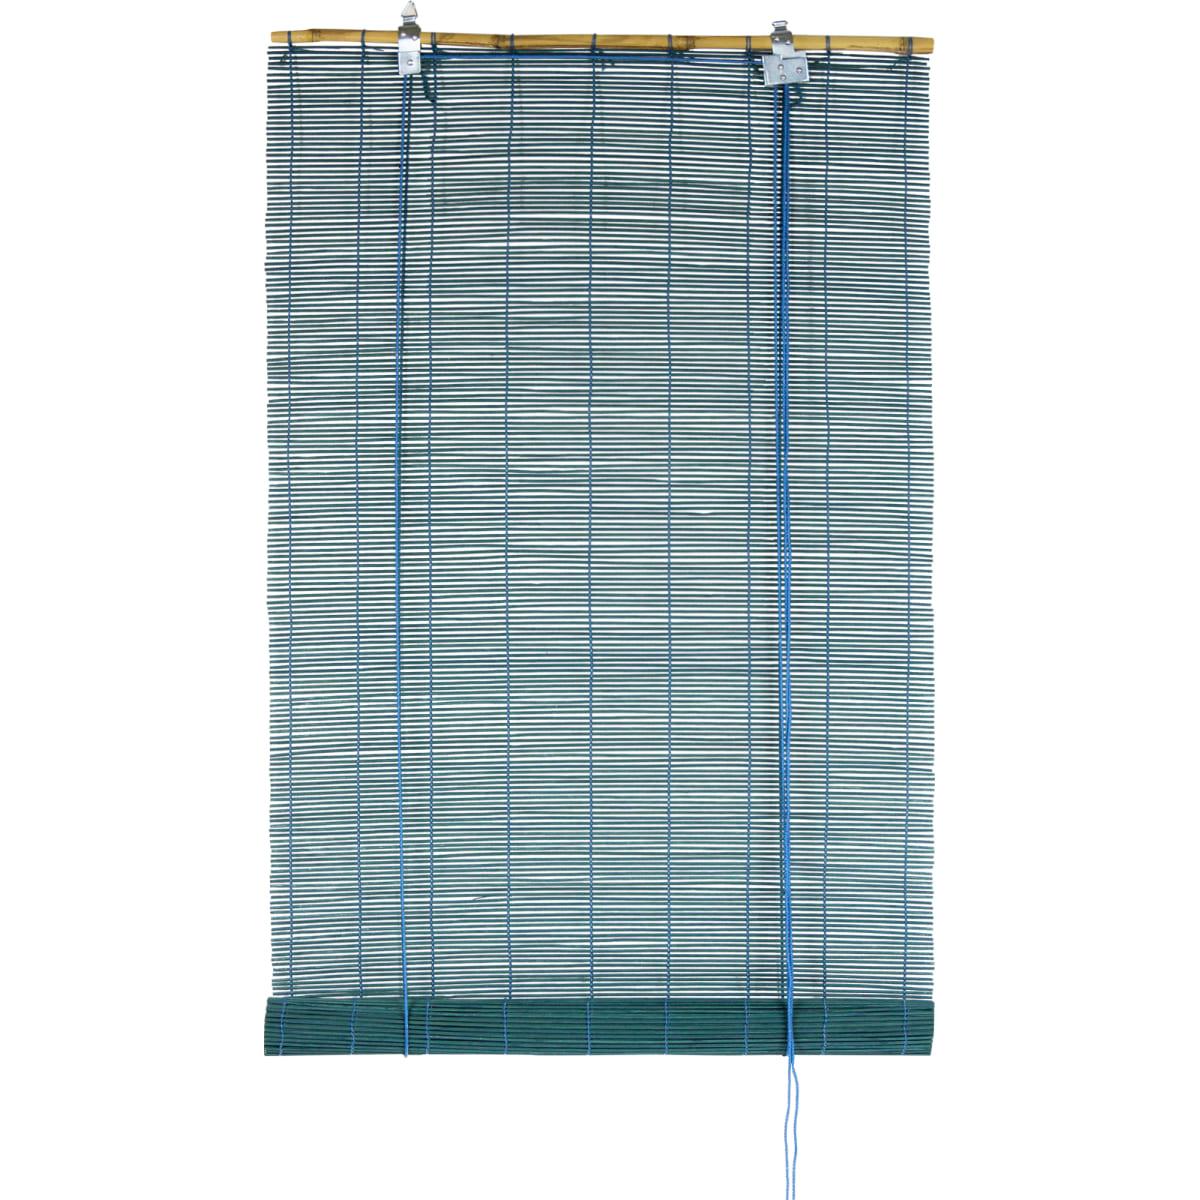 Штора рулонная «Бамбук» 60Х160 см, цвет бирюзовый